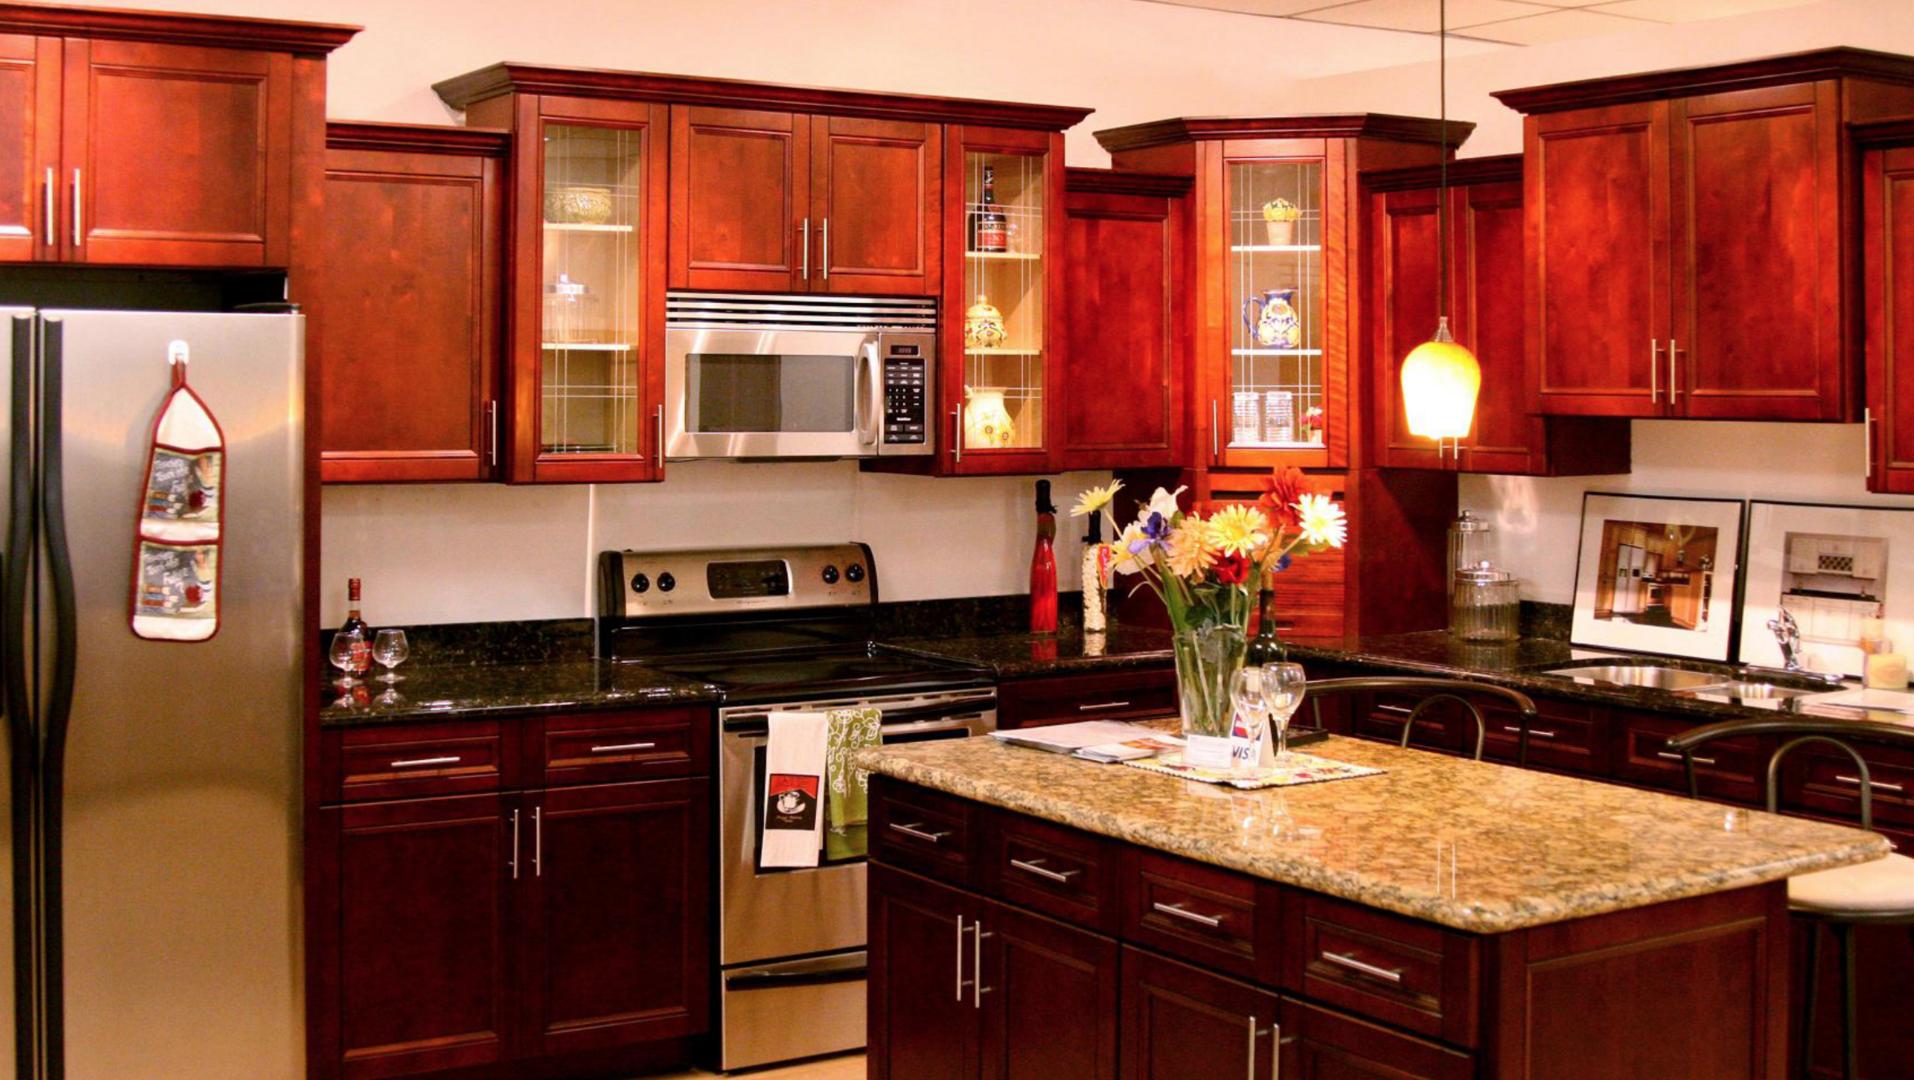 Sarasota Kitchen Remodeling Contractor